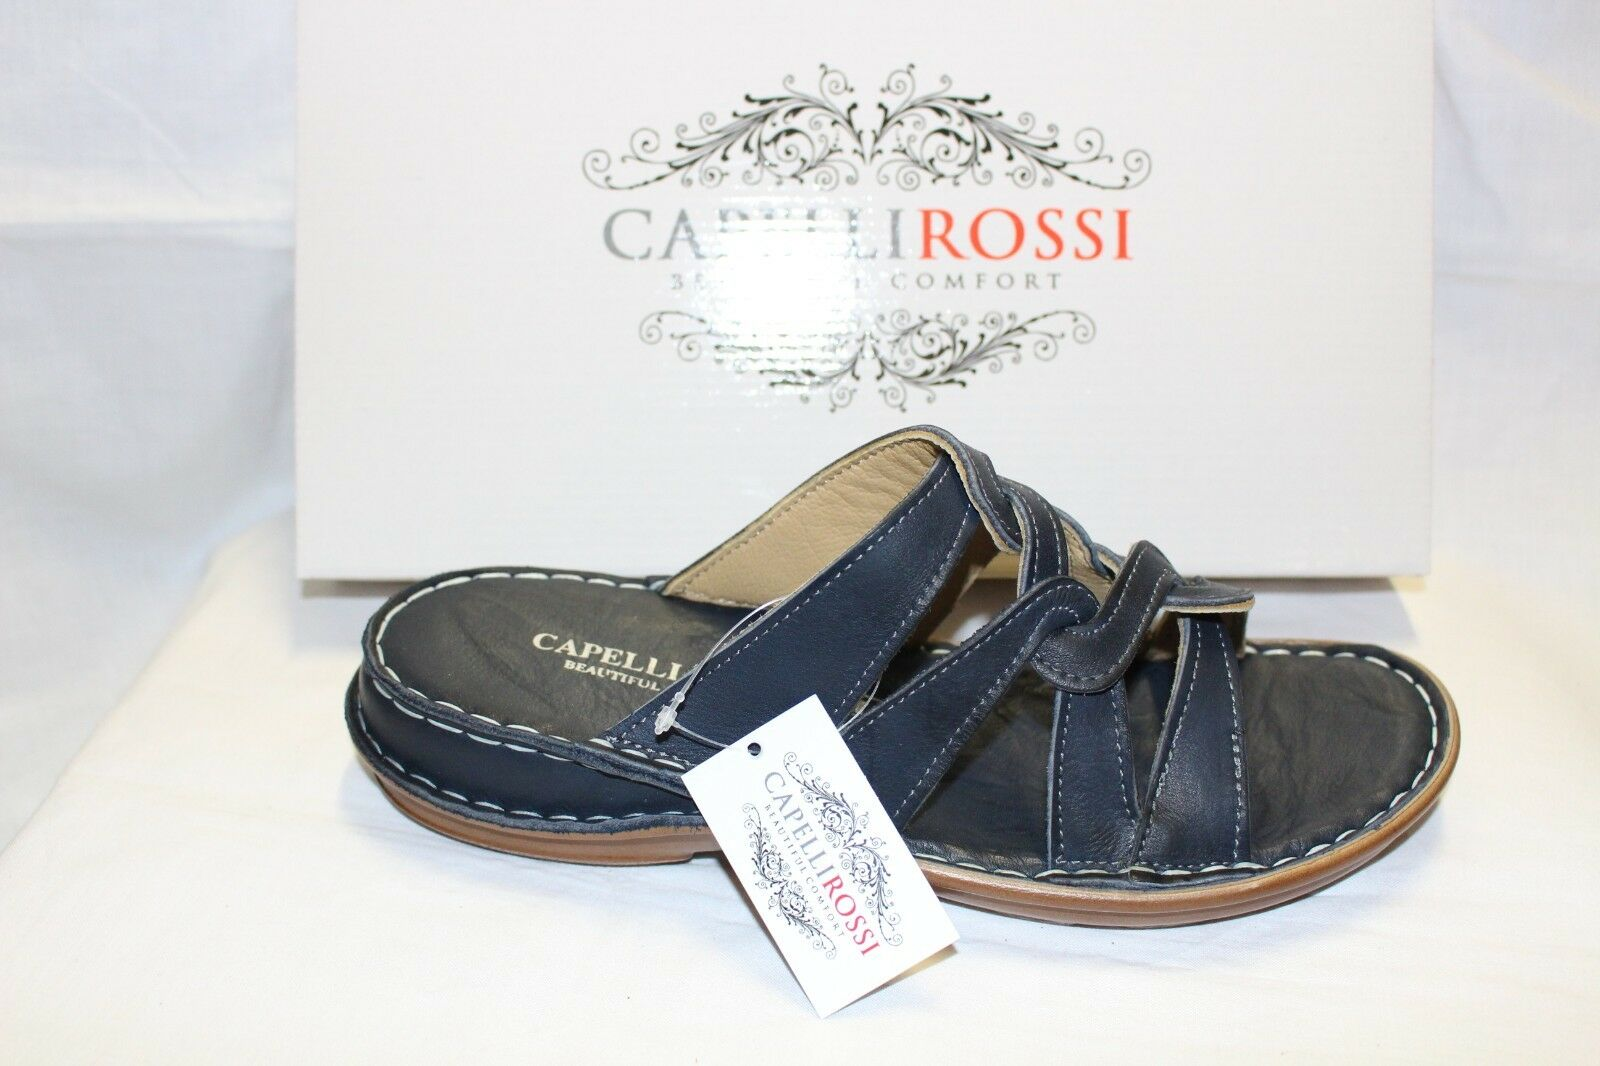 LADIES scarpe FOOTWEAR - Capelli Rossi scuff 323 navy